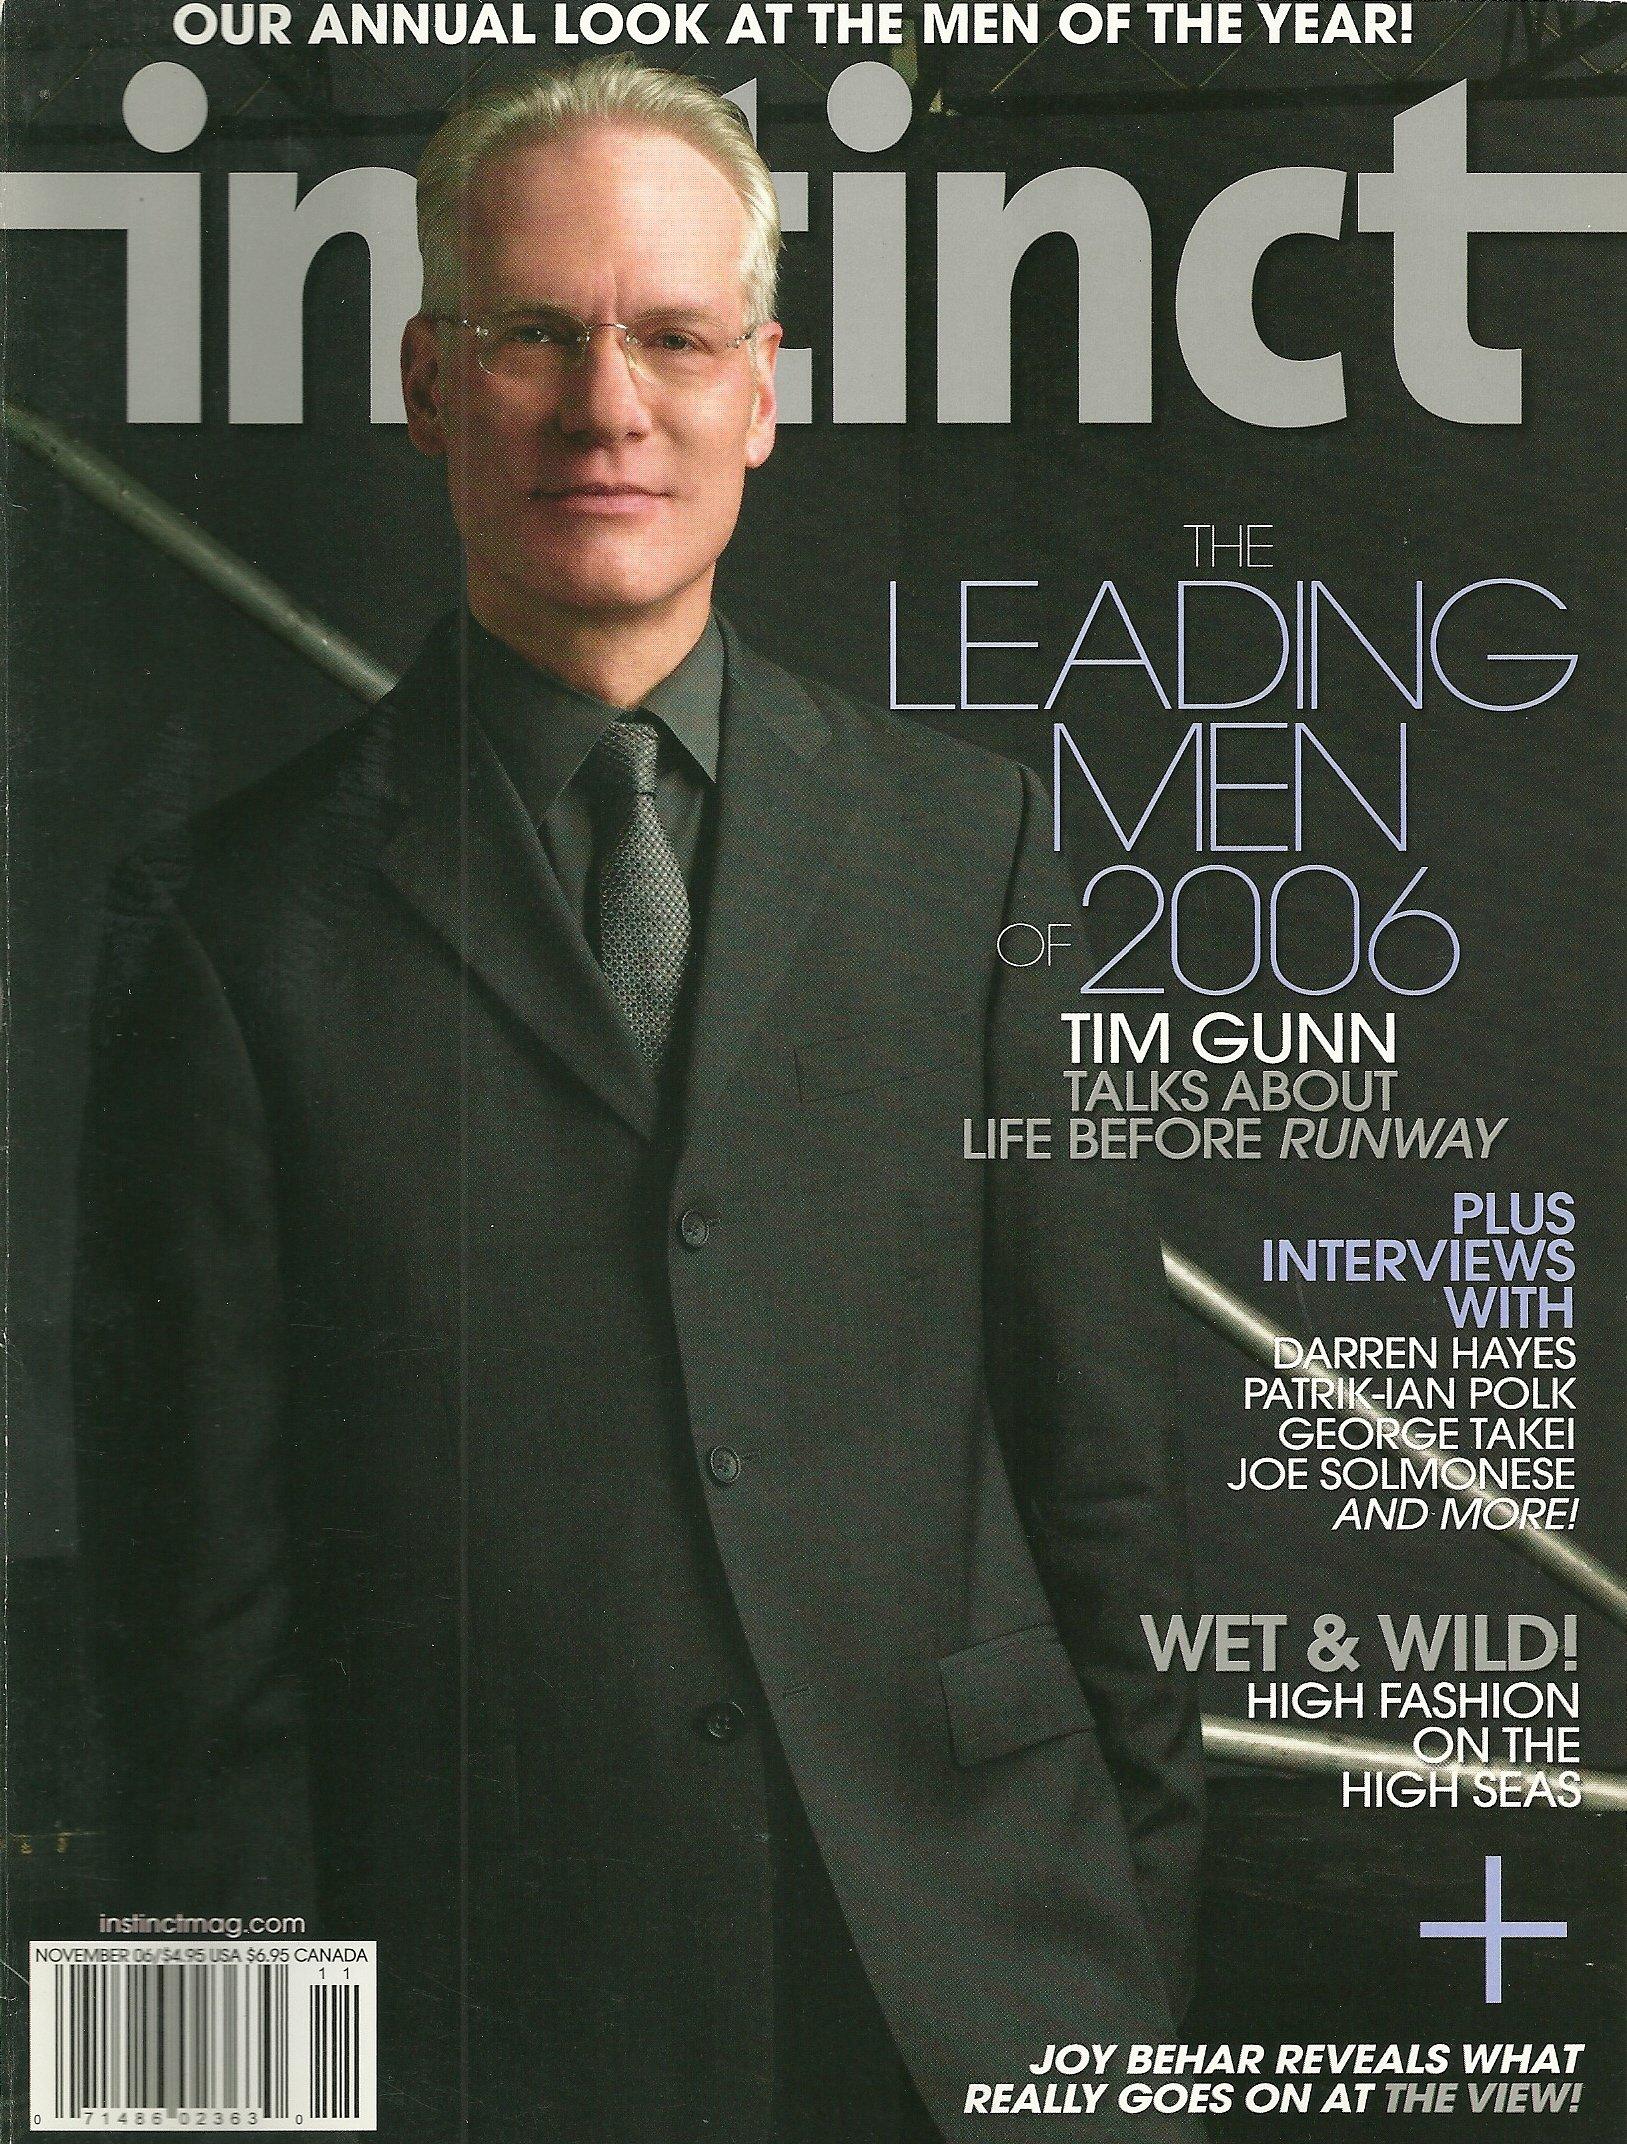 Tim Gunn, Darren Hayes, Justin Hartley, the Leading Men of the Year Issue -  November, 2006 Volume 9 Issue 11 Instinct Magazine [Gay Interest] Paperback  – ...